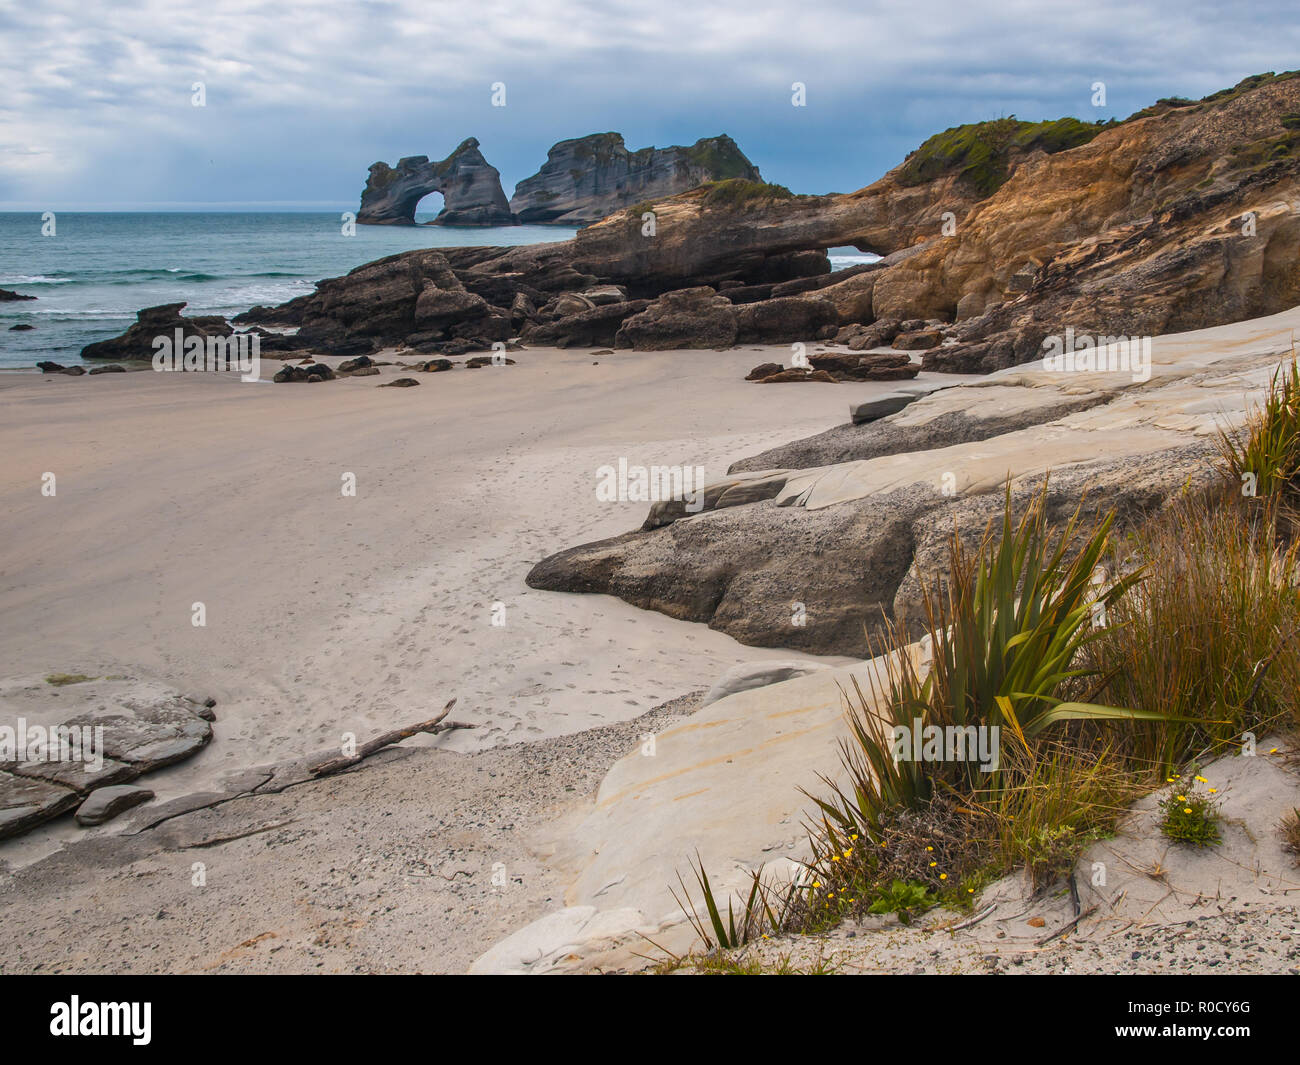 Rock formations on Wharariki Beach, North Island, New Zealand Stock Photo